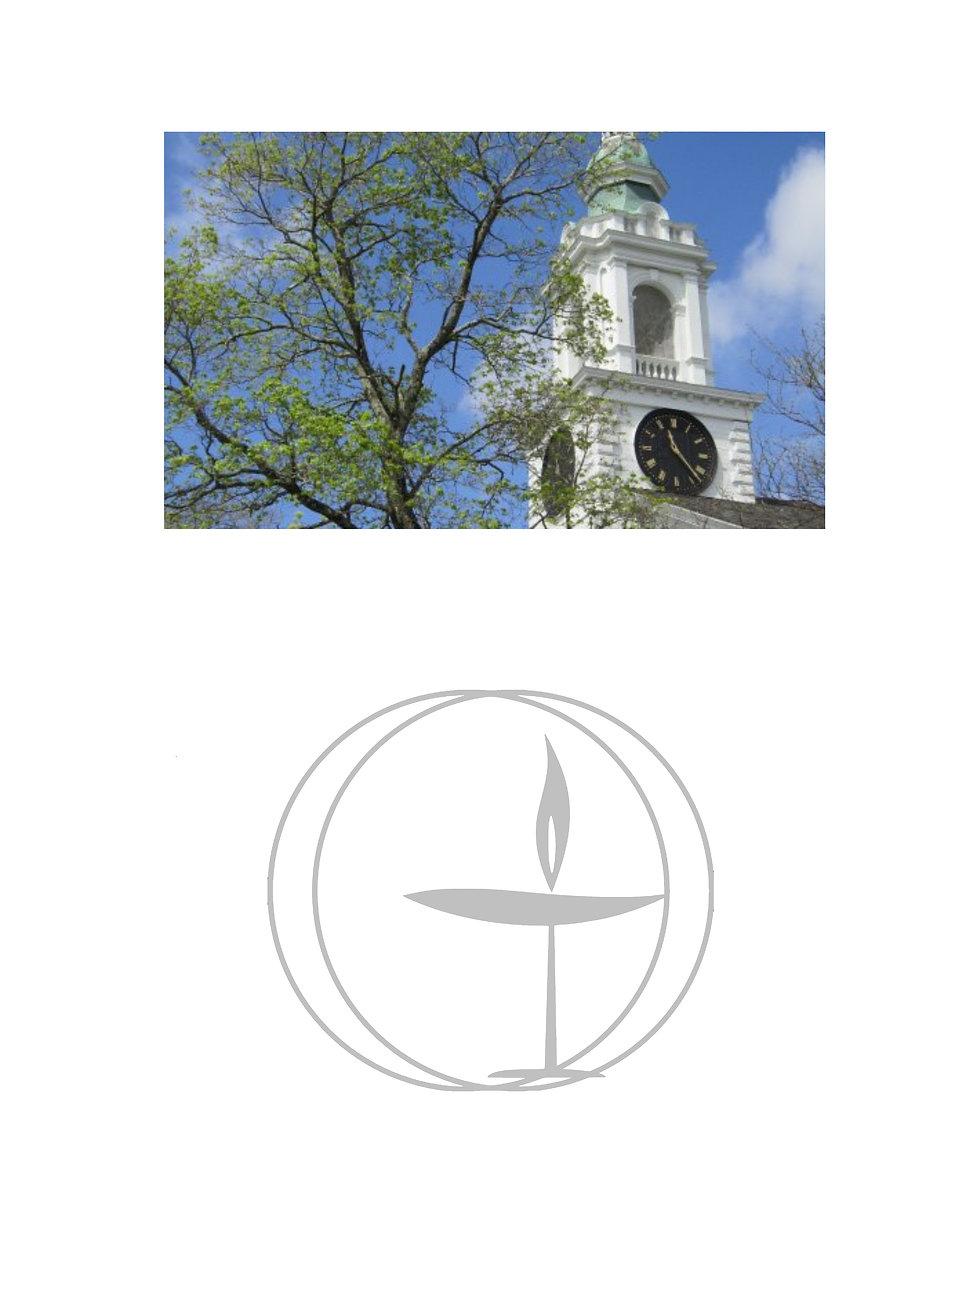 Church steeple Strip Background Image 3Kx4K.jpg